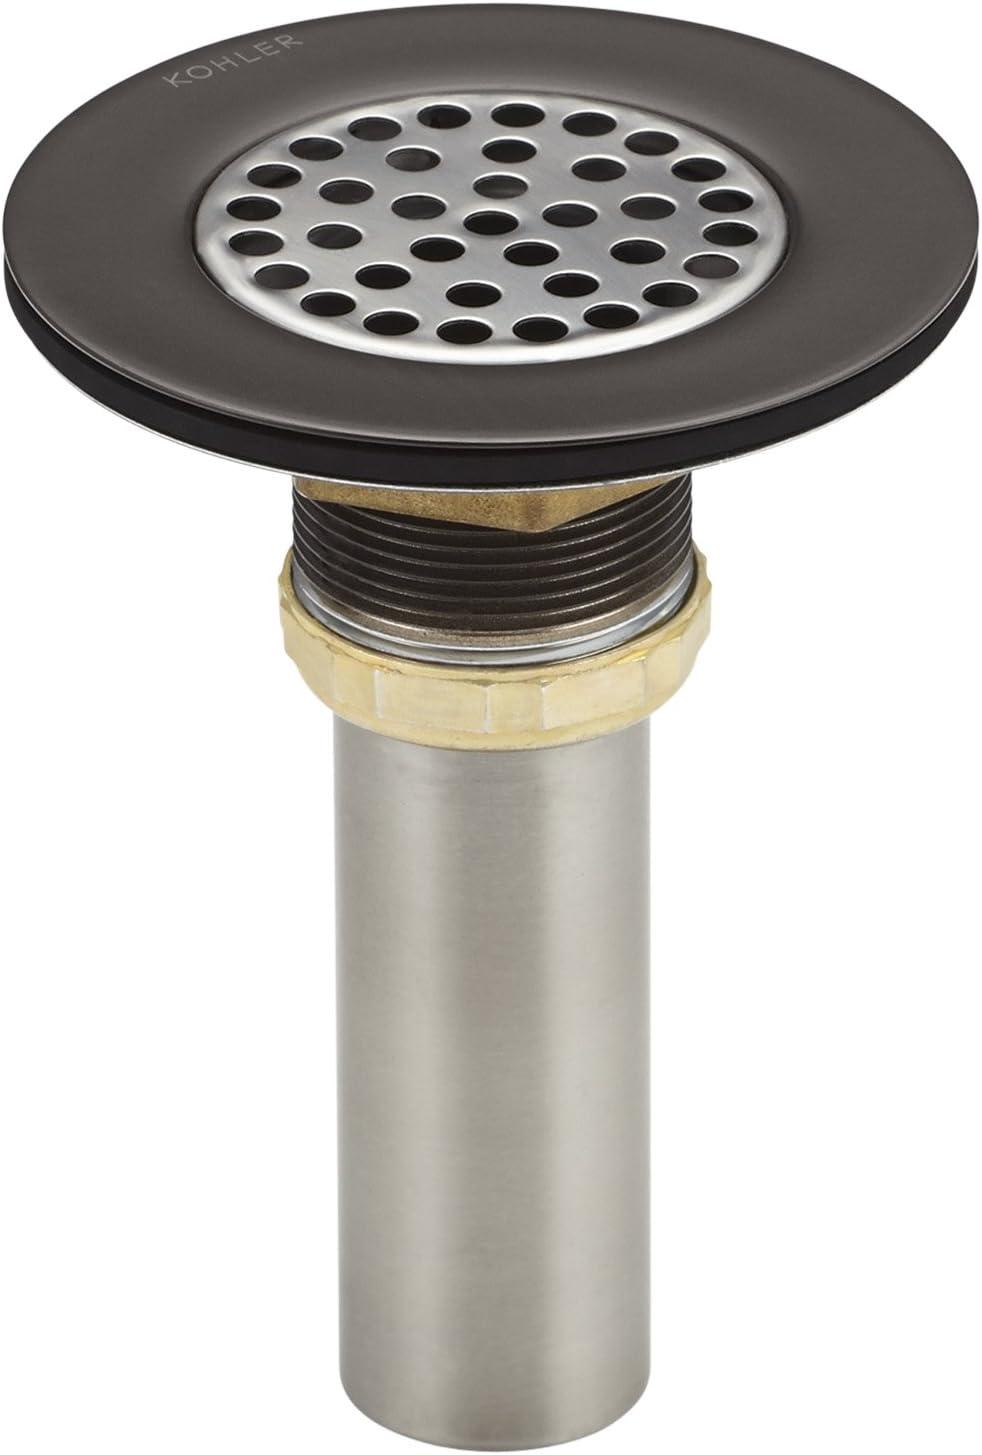 KOHLER K-8807-2BZ Brass Sink Strainer 2